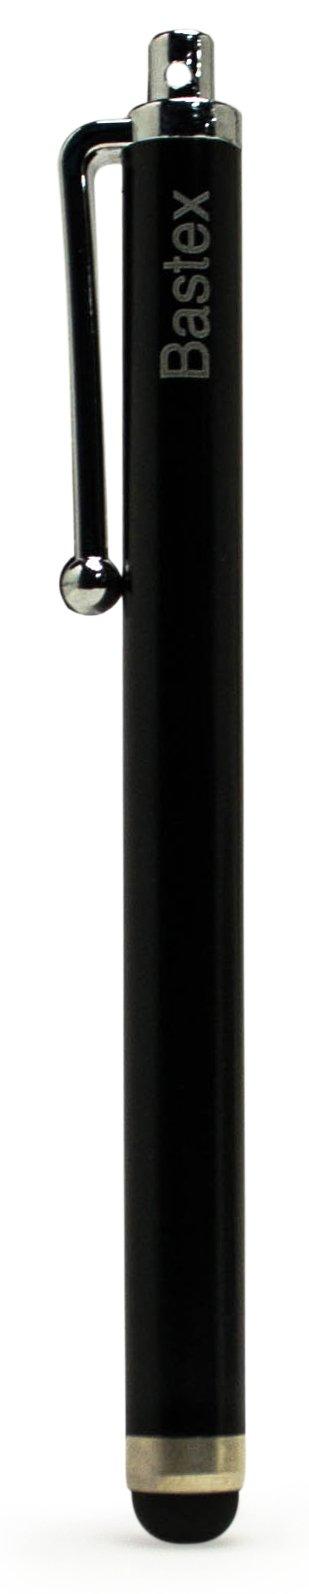 Samsung Galaxy S5 OEM Original Standard Li-ion Battery 2800mAh for Galaxy S5 - Non-Retail Packaging - Black/Silver (Renewed)